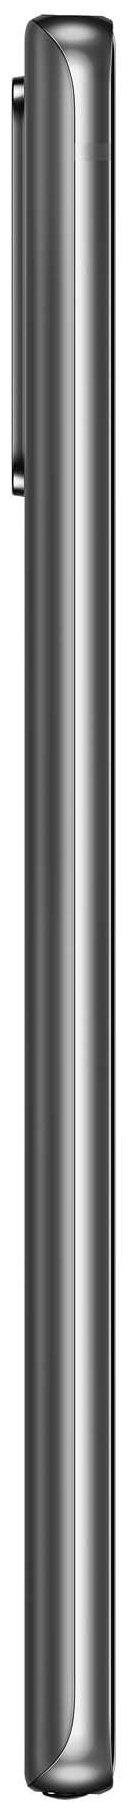 Samsung Galaxy Note 20 8/256GB - интернет: 4G LTE